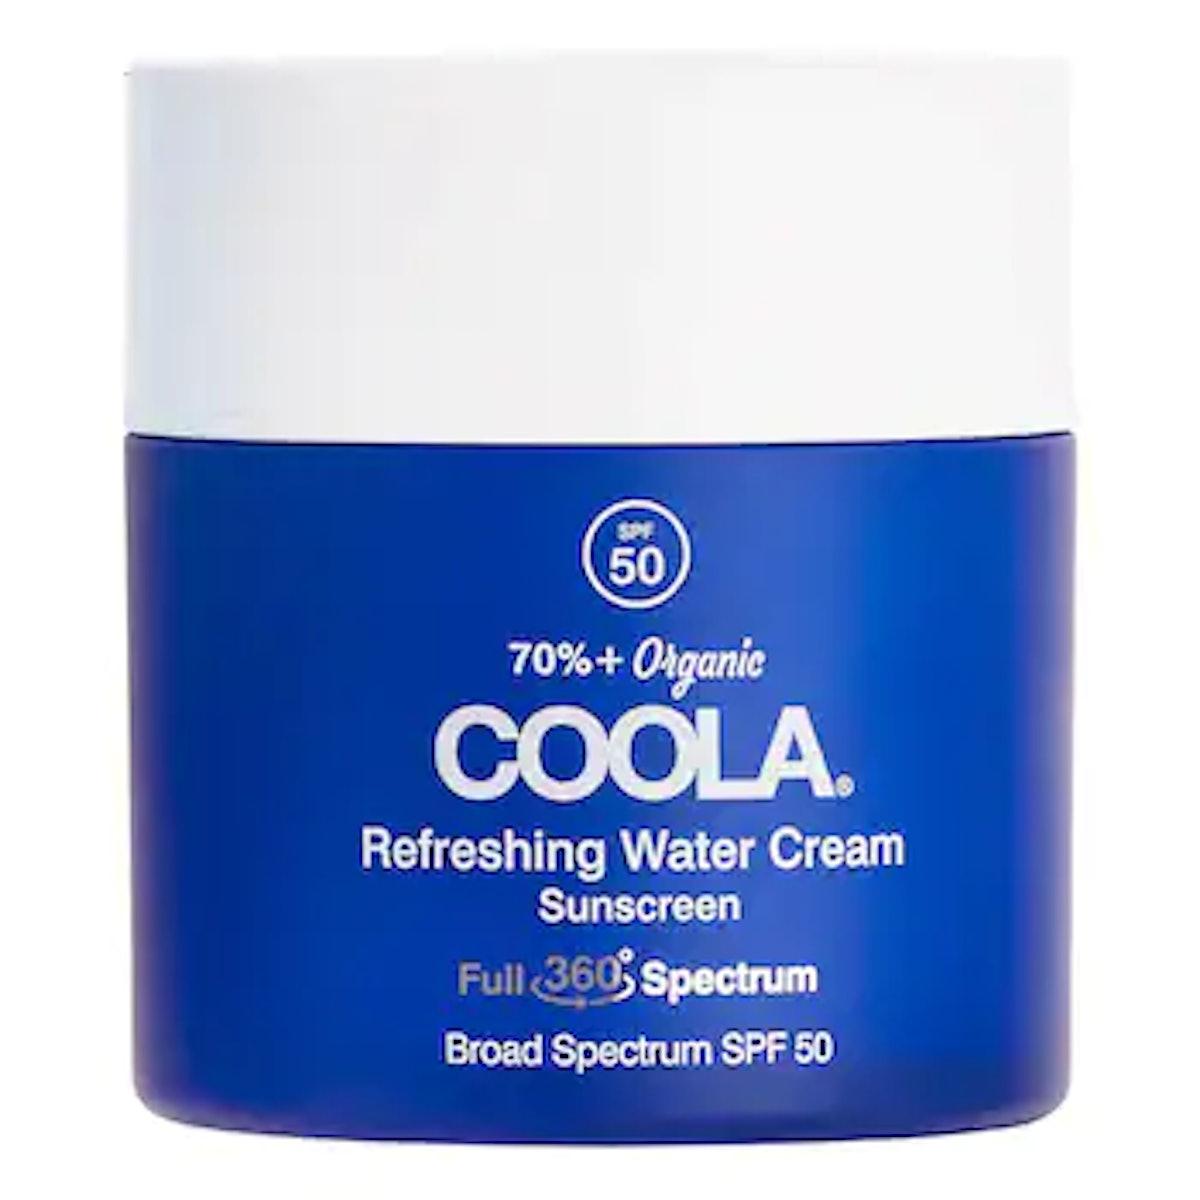 Full Spectrum 360º Refreshing Water Cream Organic Face Sunscreen SPF 50